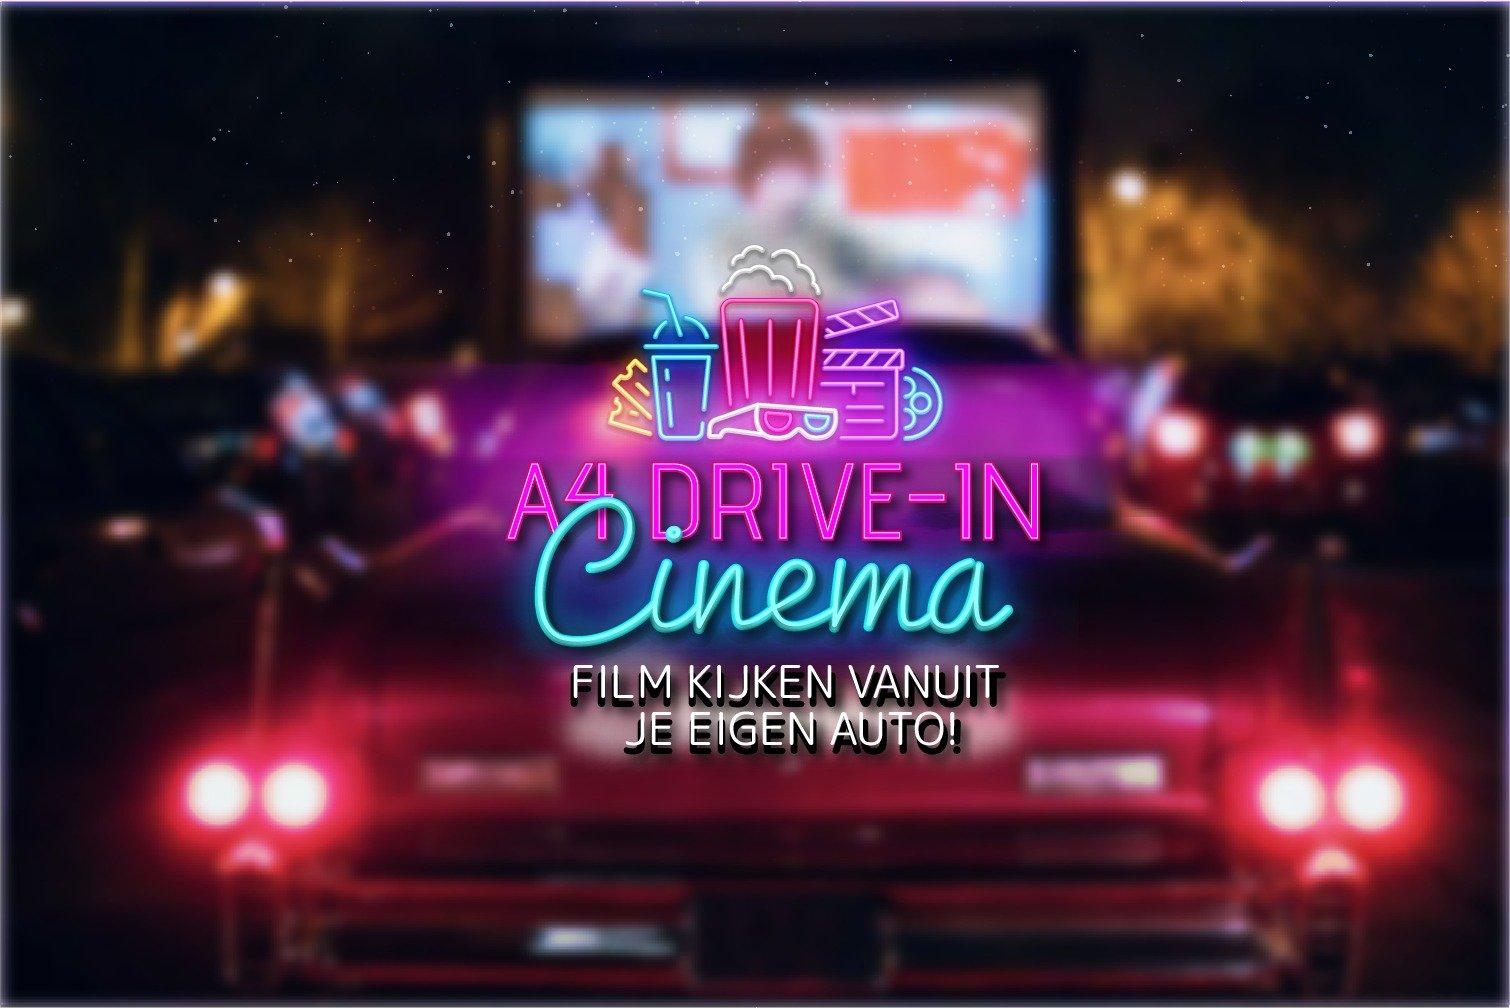 Drive-in bioscoop: Sing